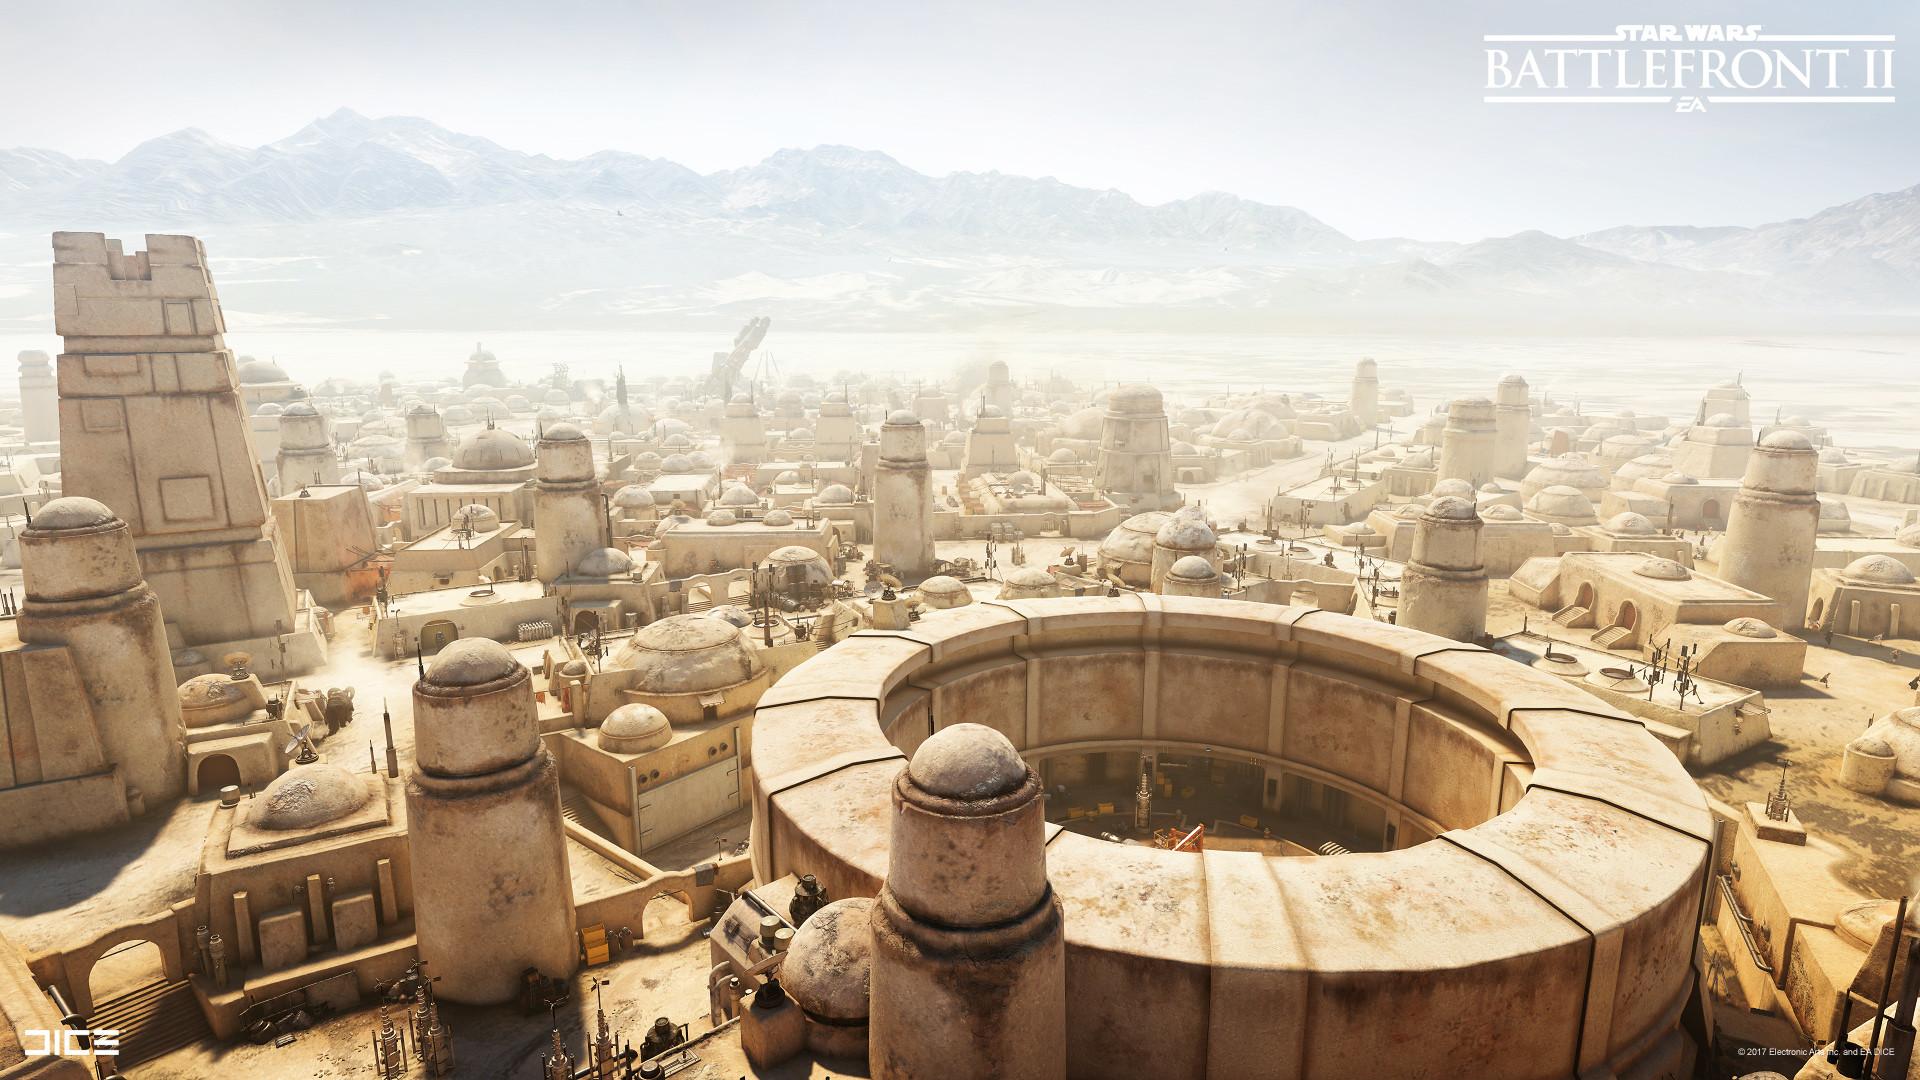 Tatooine Mos Eisley Star Wars Battlefront Wiki Fandom Powered